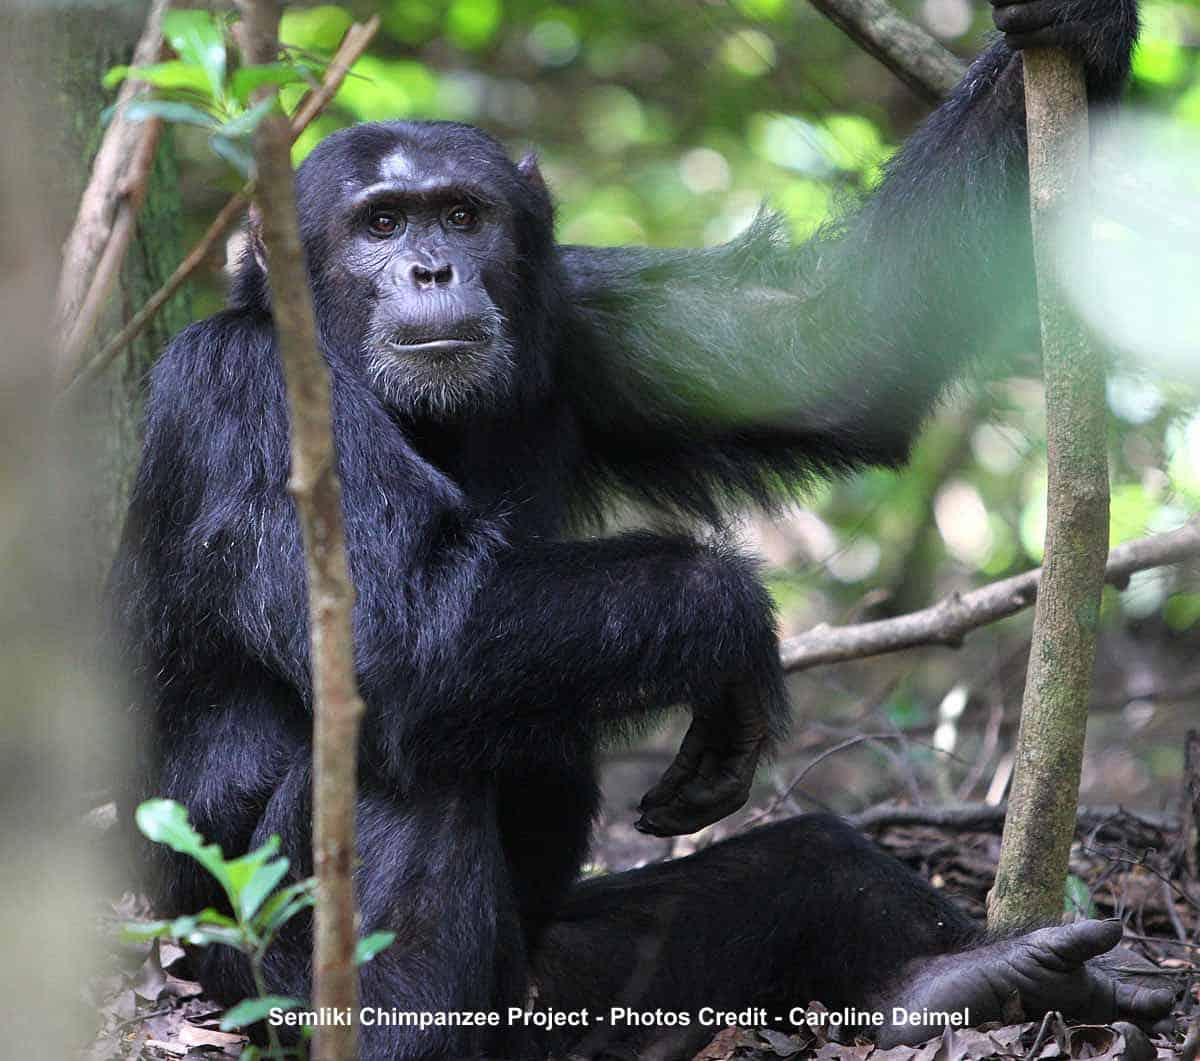 Chimpanzees Of The Semliki Project